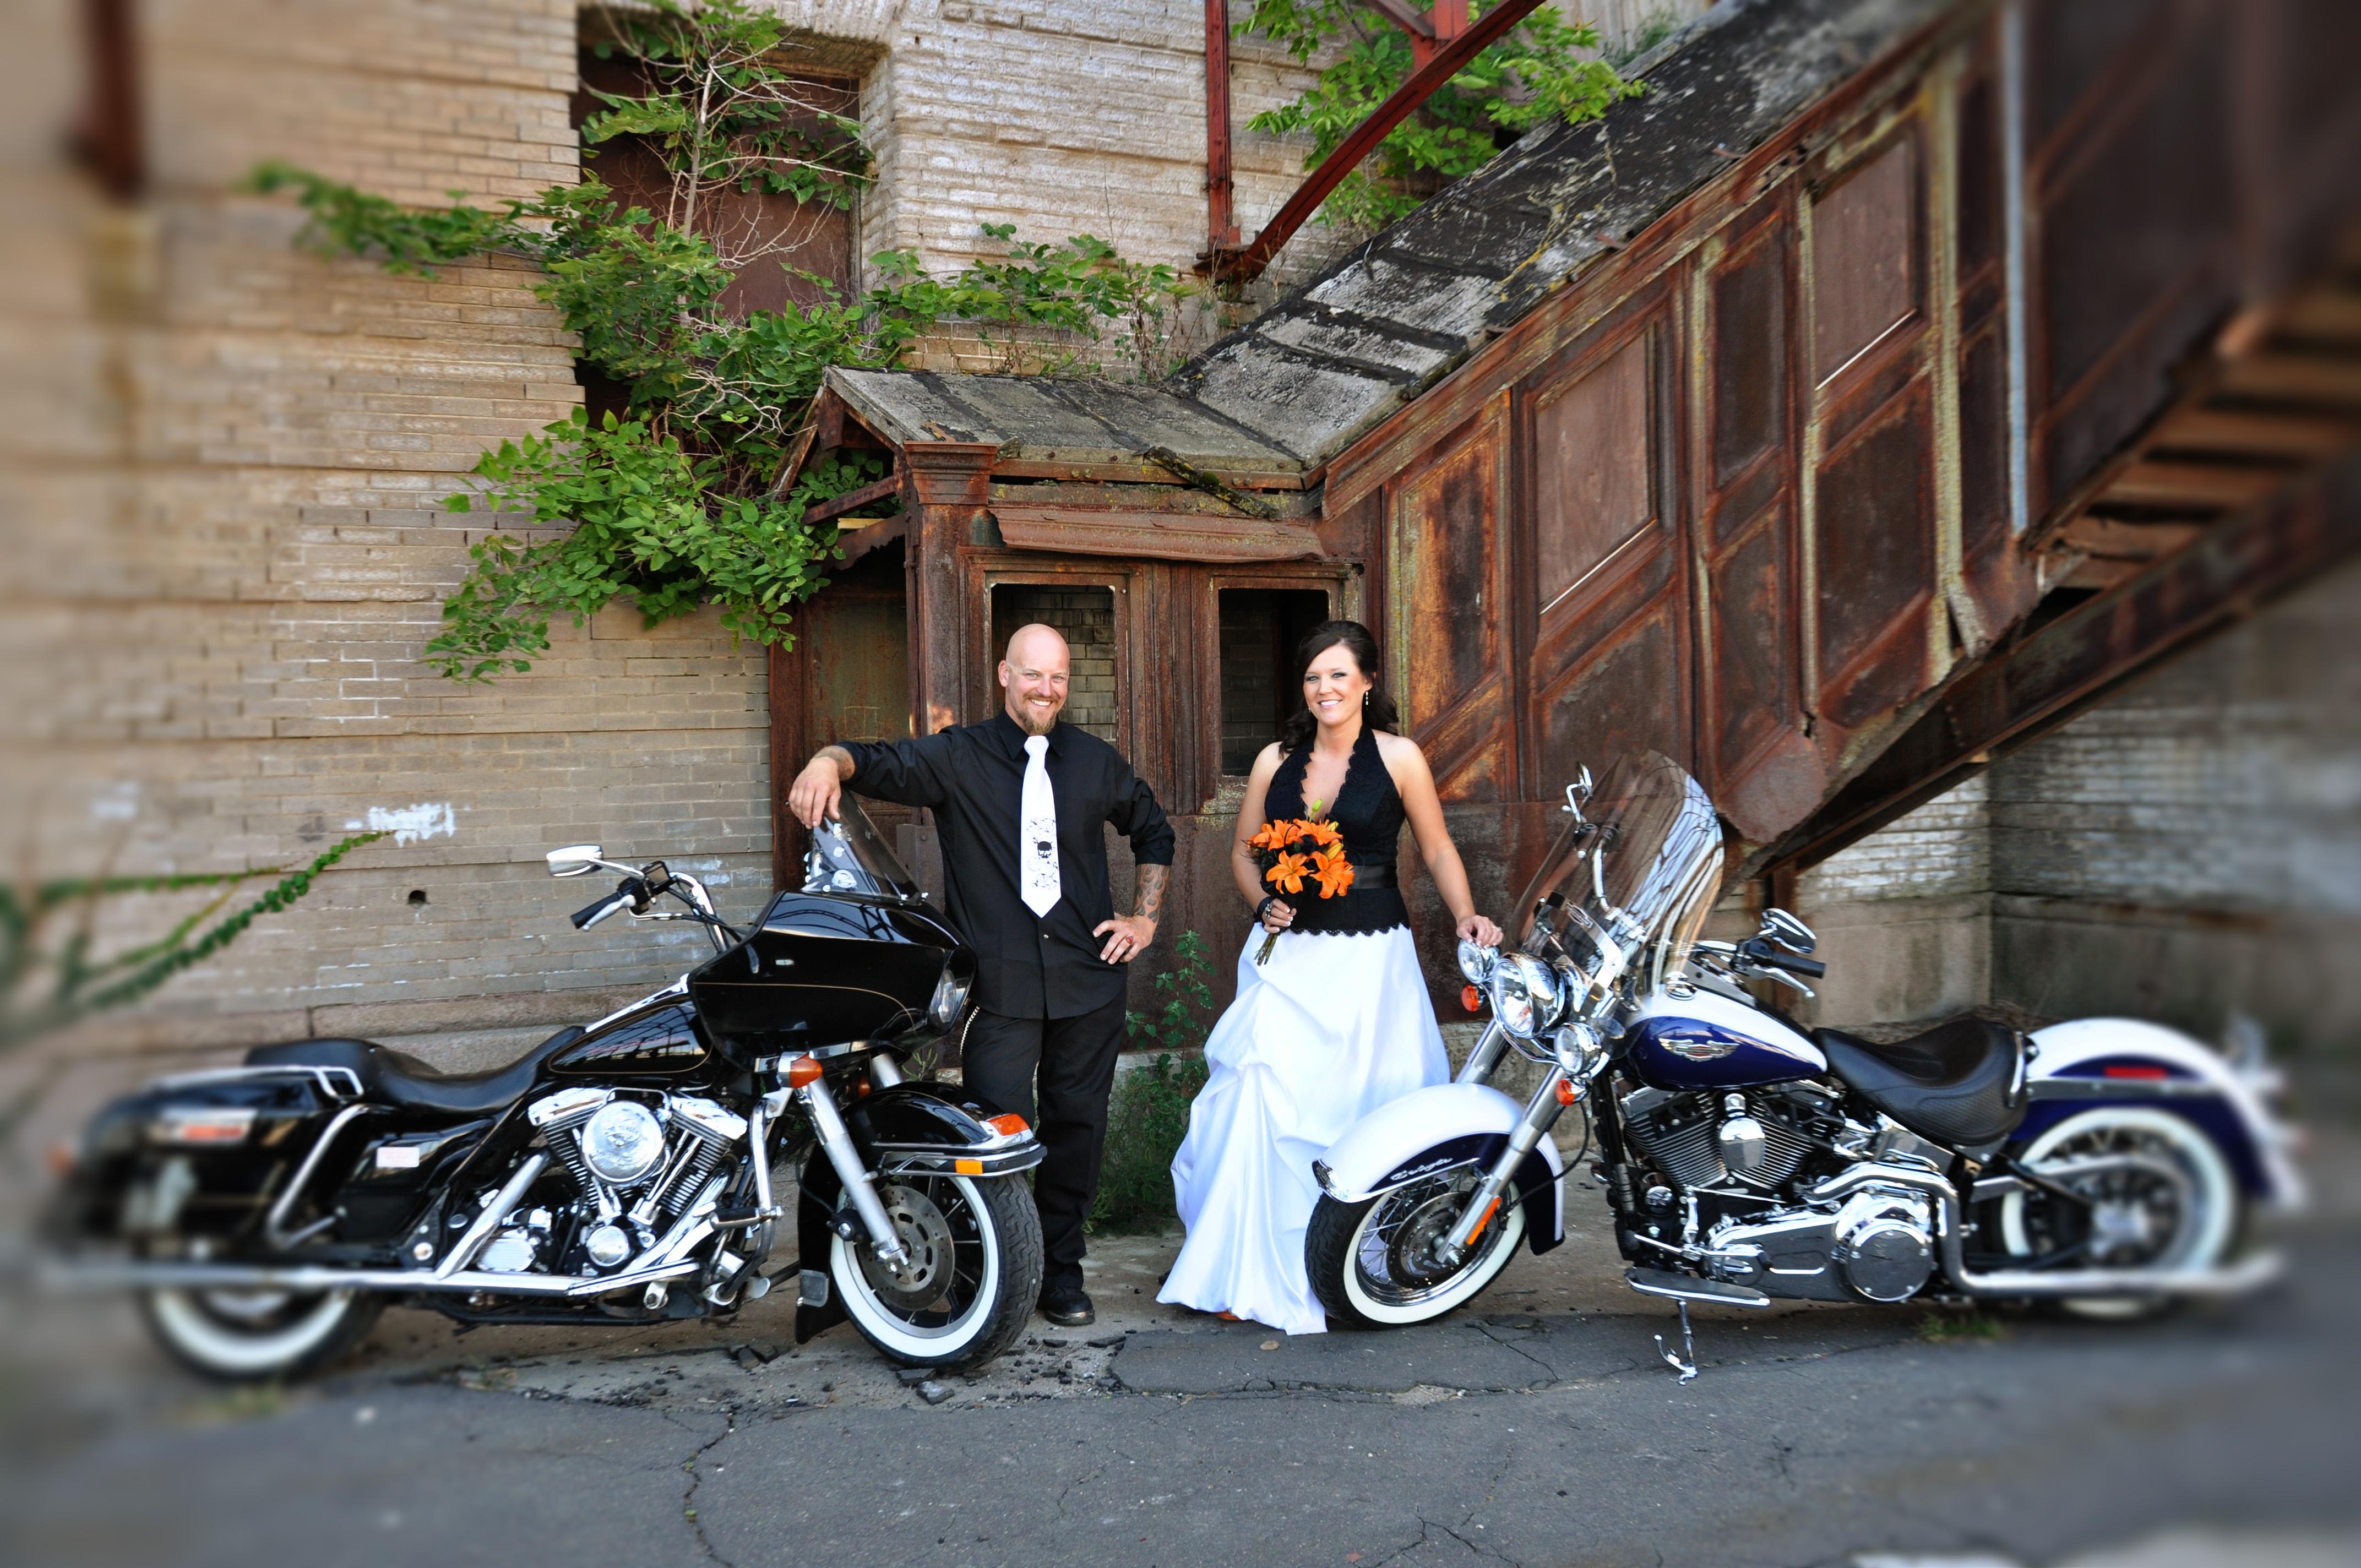 Harley Davidson Wedding: Our Harley-Davidson Wedding- Part 1